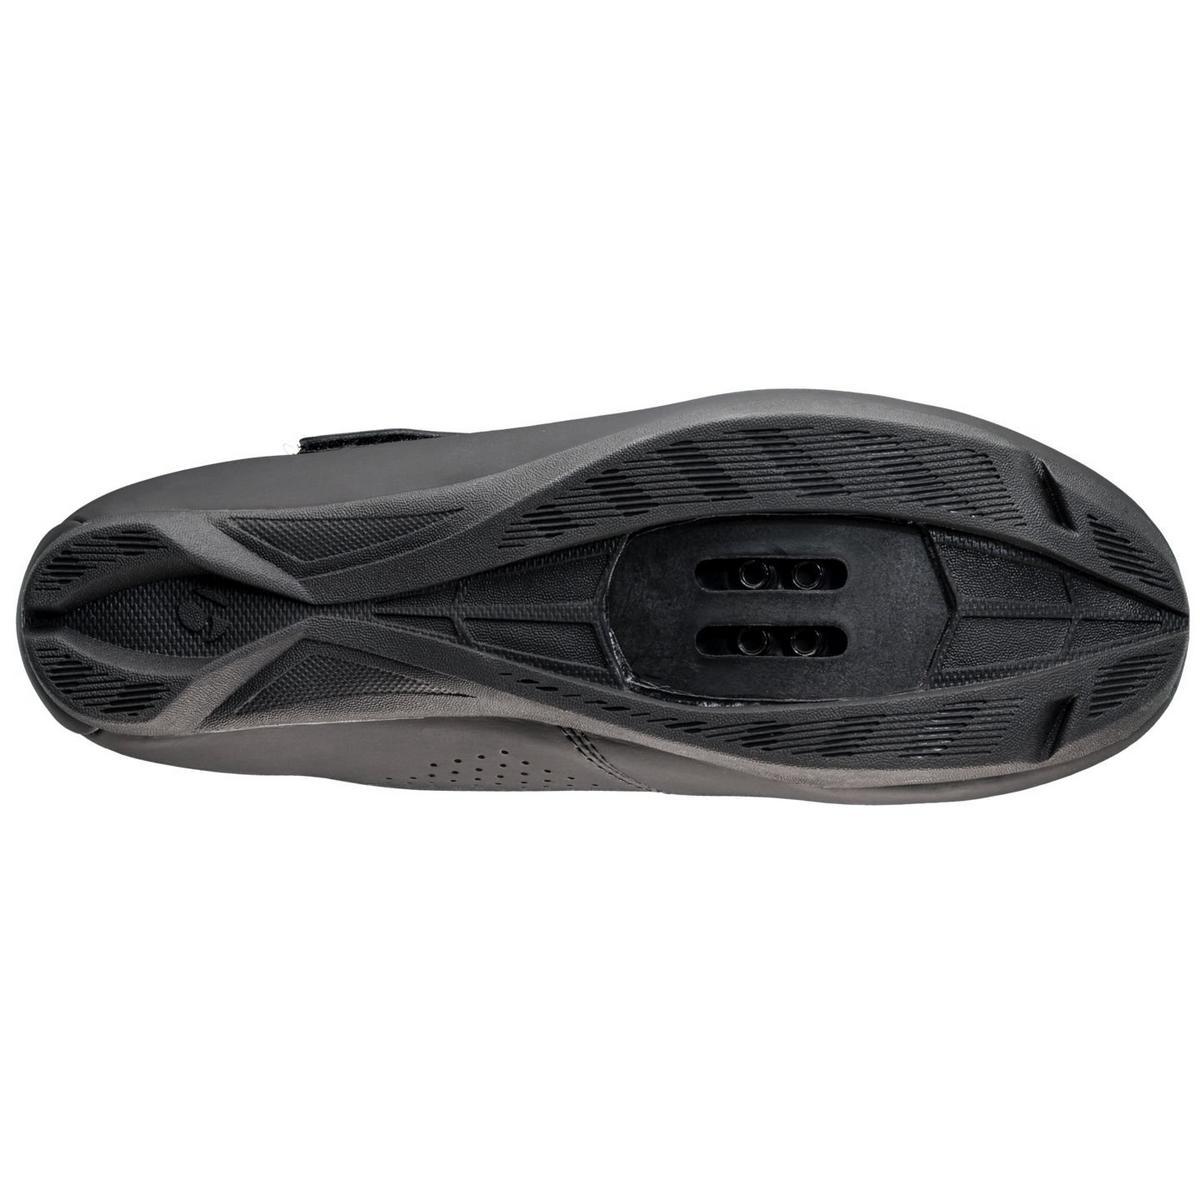 Bontrager Women's Vella Road Shoe